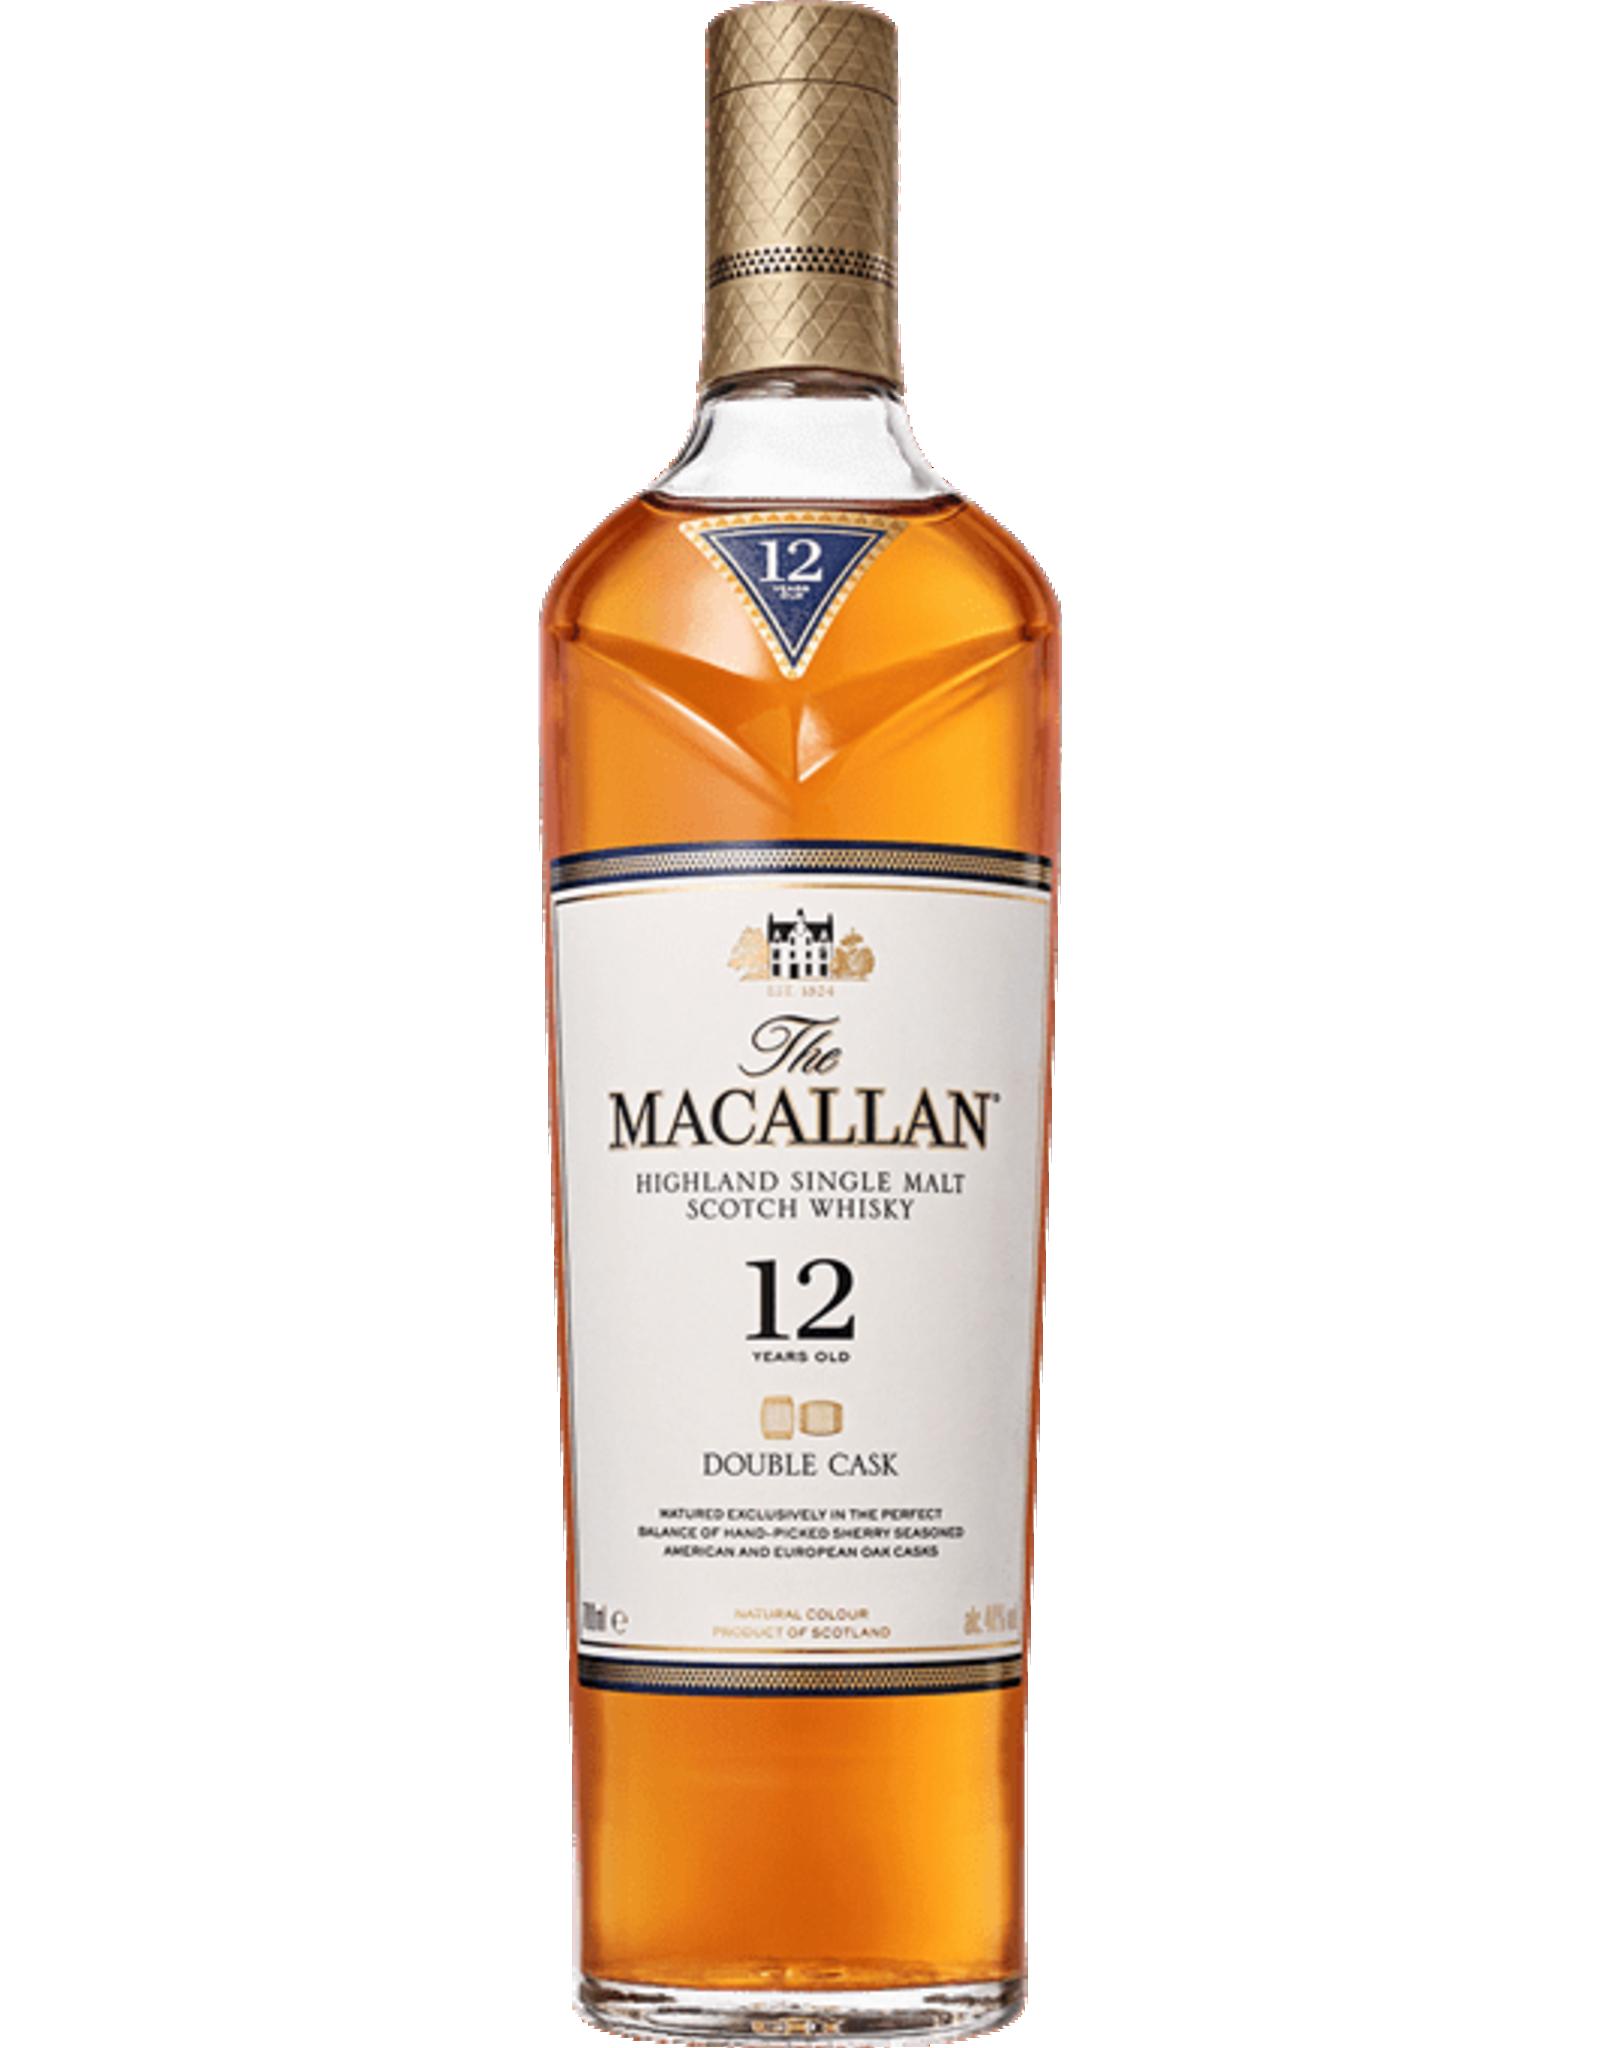 The Macallan 12 year Double Cask Scotch